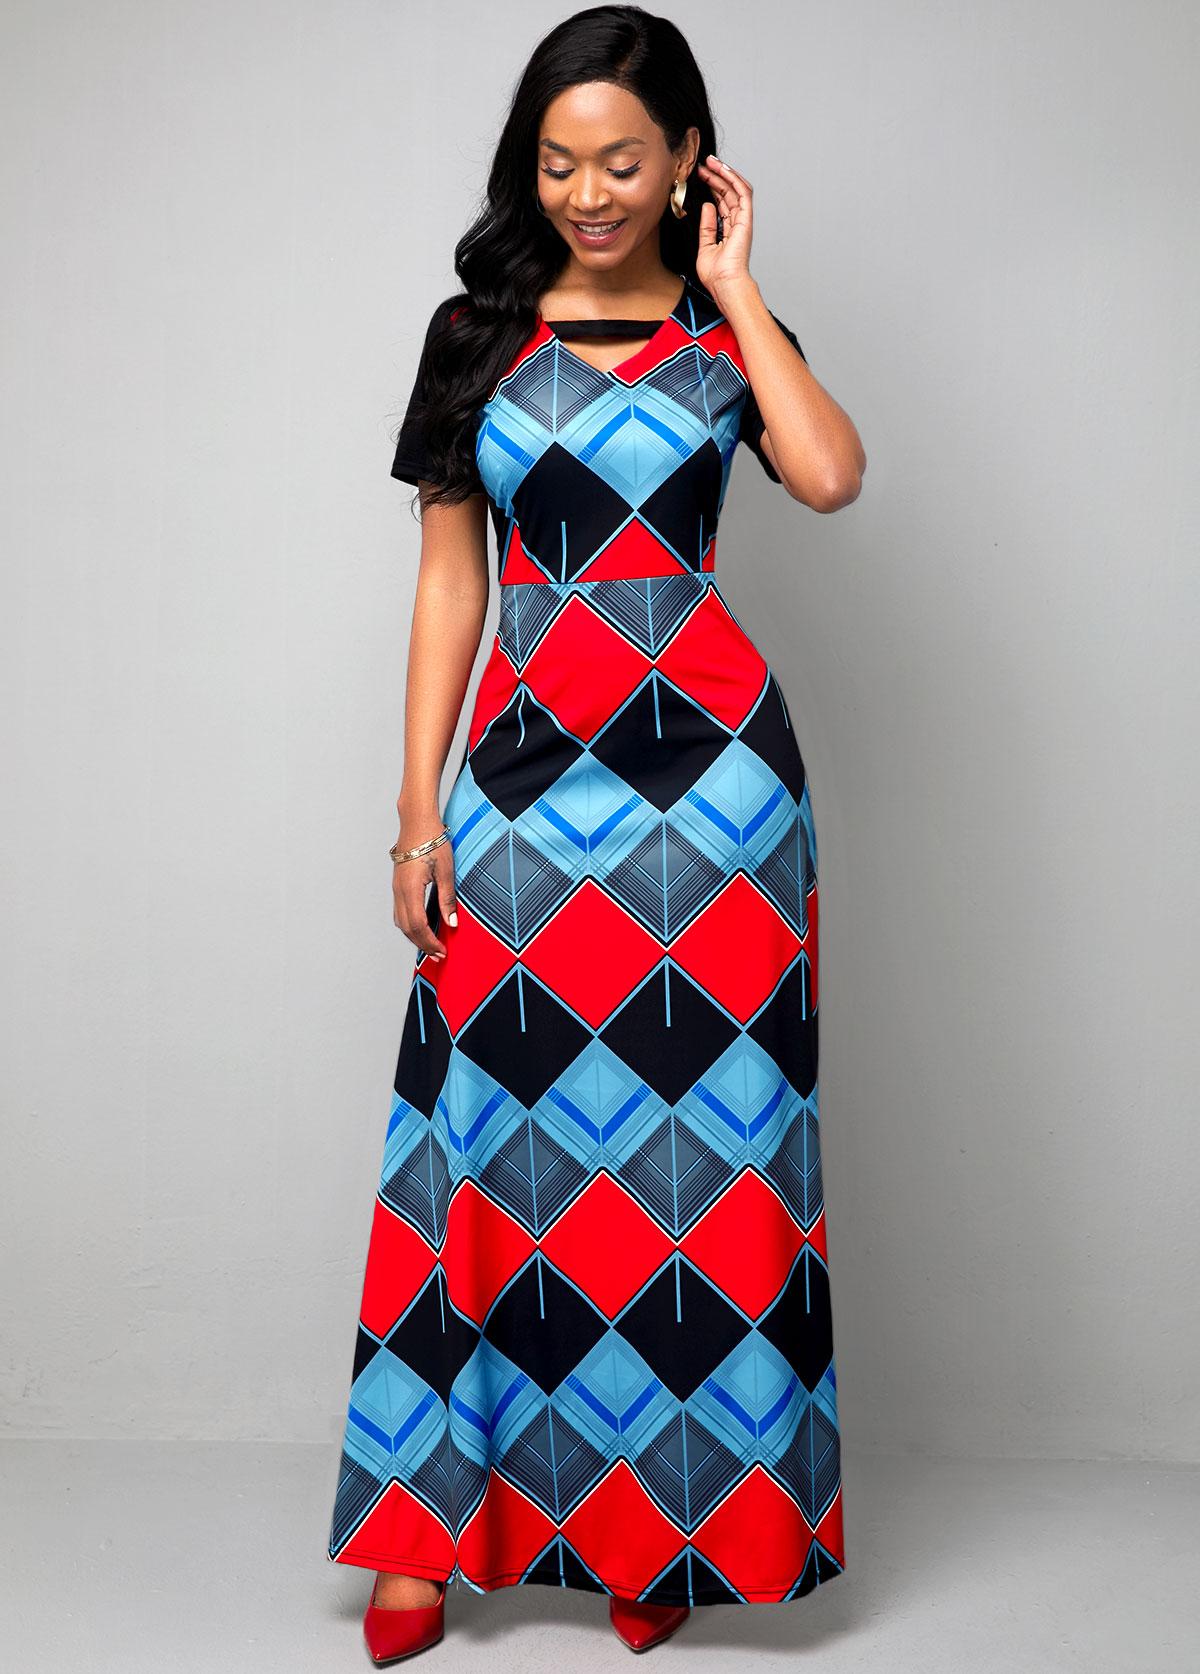 Geometric Print Keyhole Neckline Short Sleeve Maxi Dress